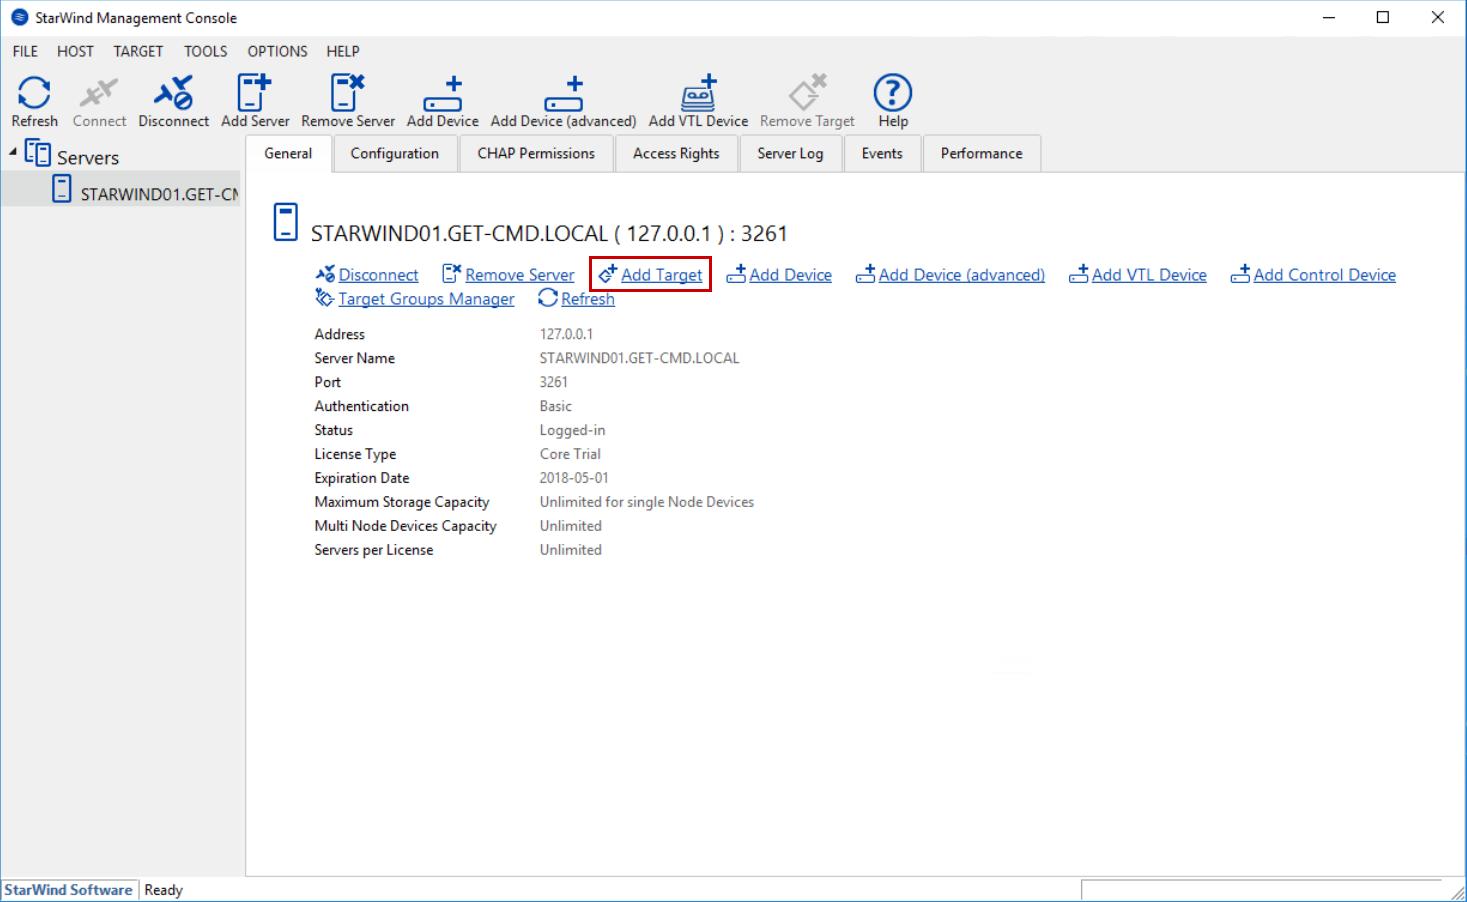 Deploying Windows Server 2016 Hyper-V Cluster with StarWind